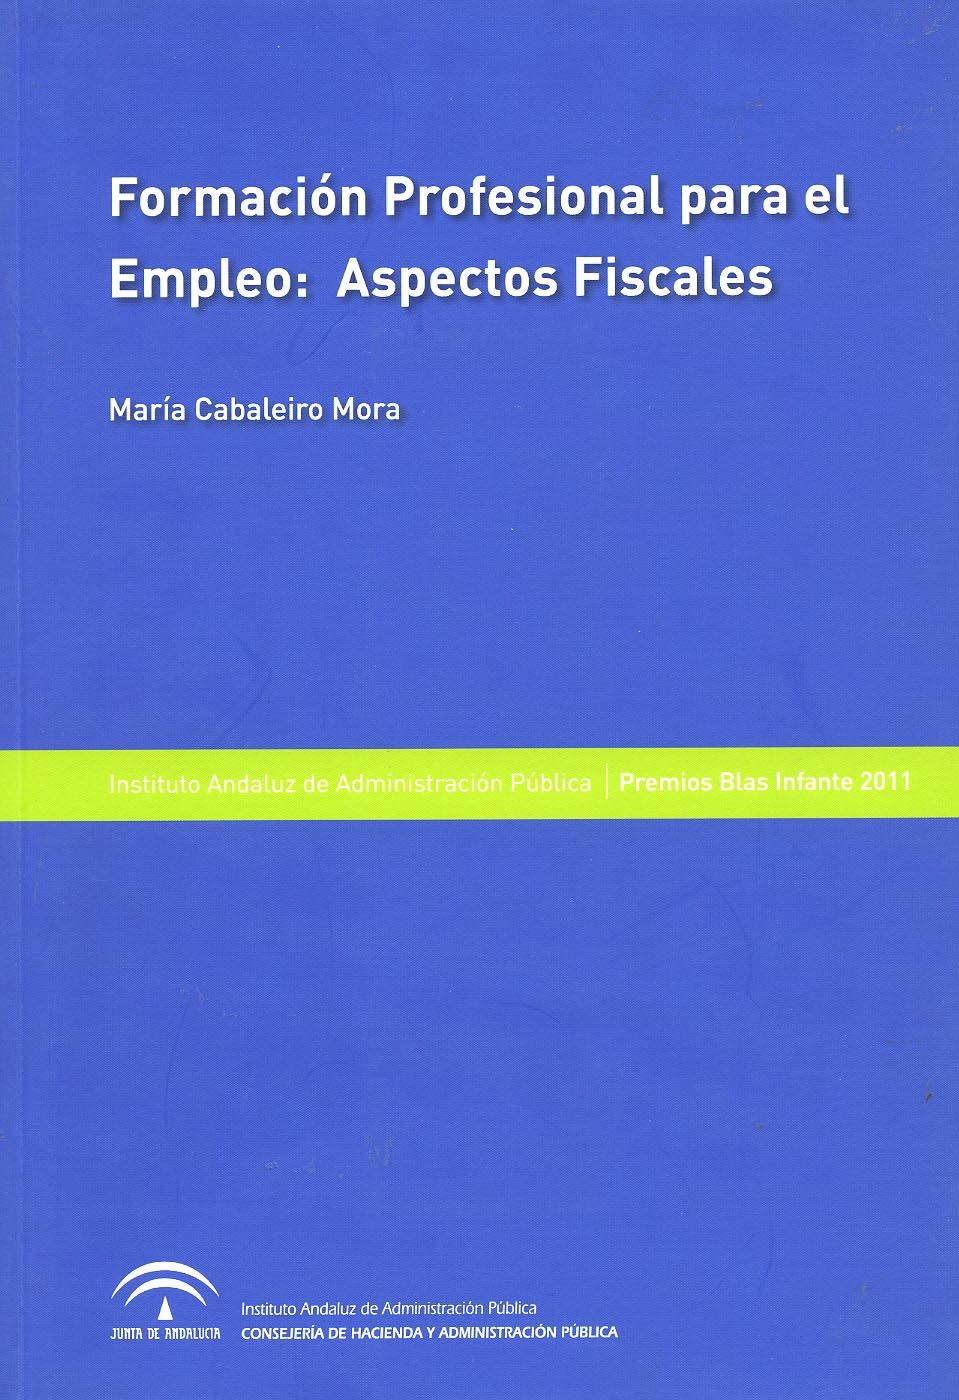 Formación profesional para el empleo : aspectos fiscales / María R. Cabaleiro Mora. - Sevilla : Instituto Andaluz de Administración Pública, 2012